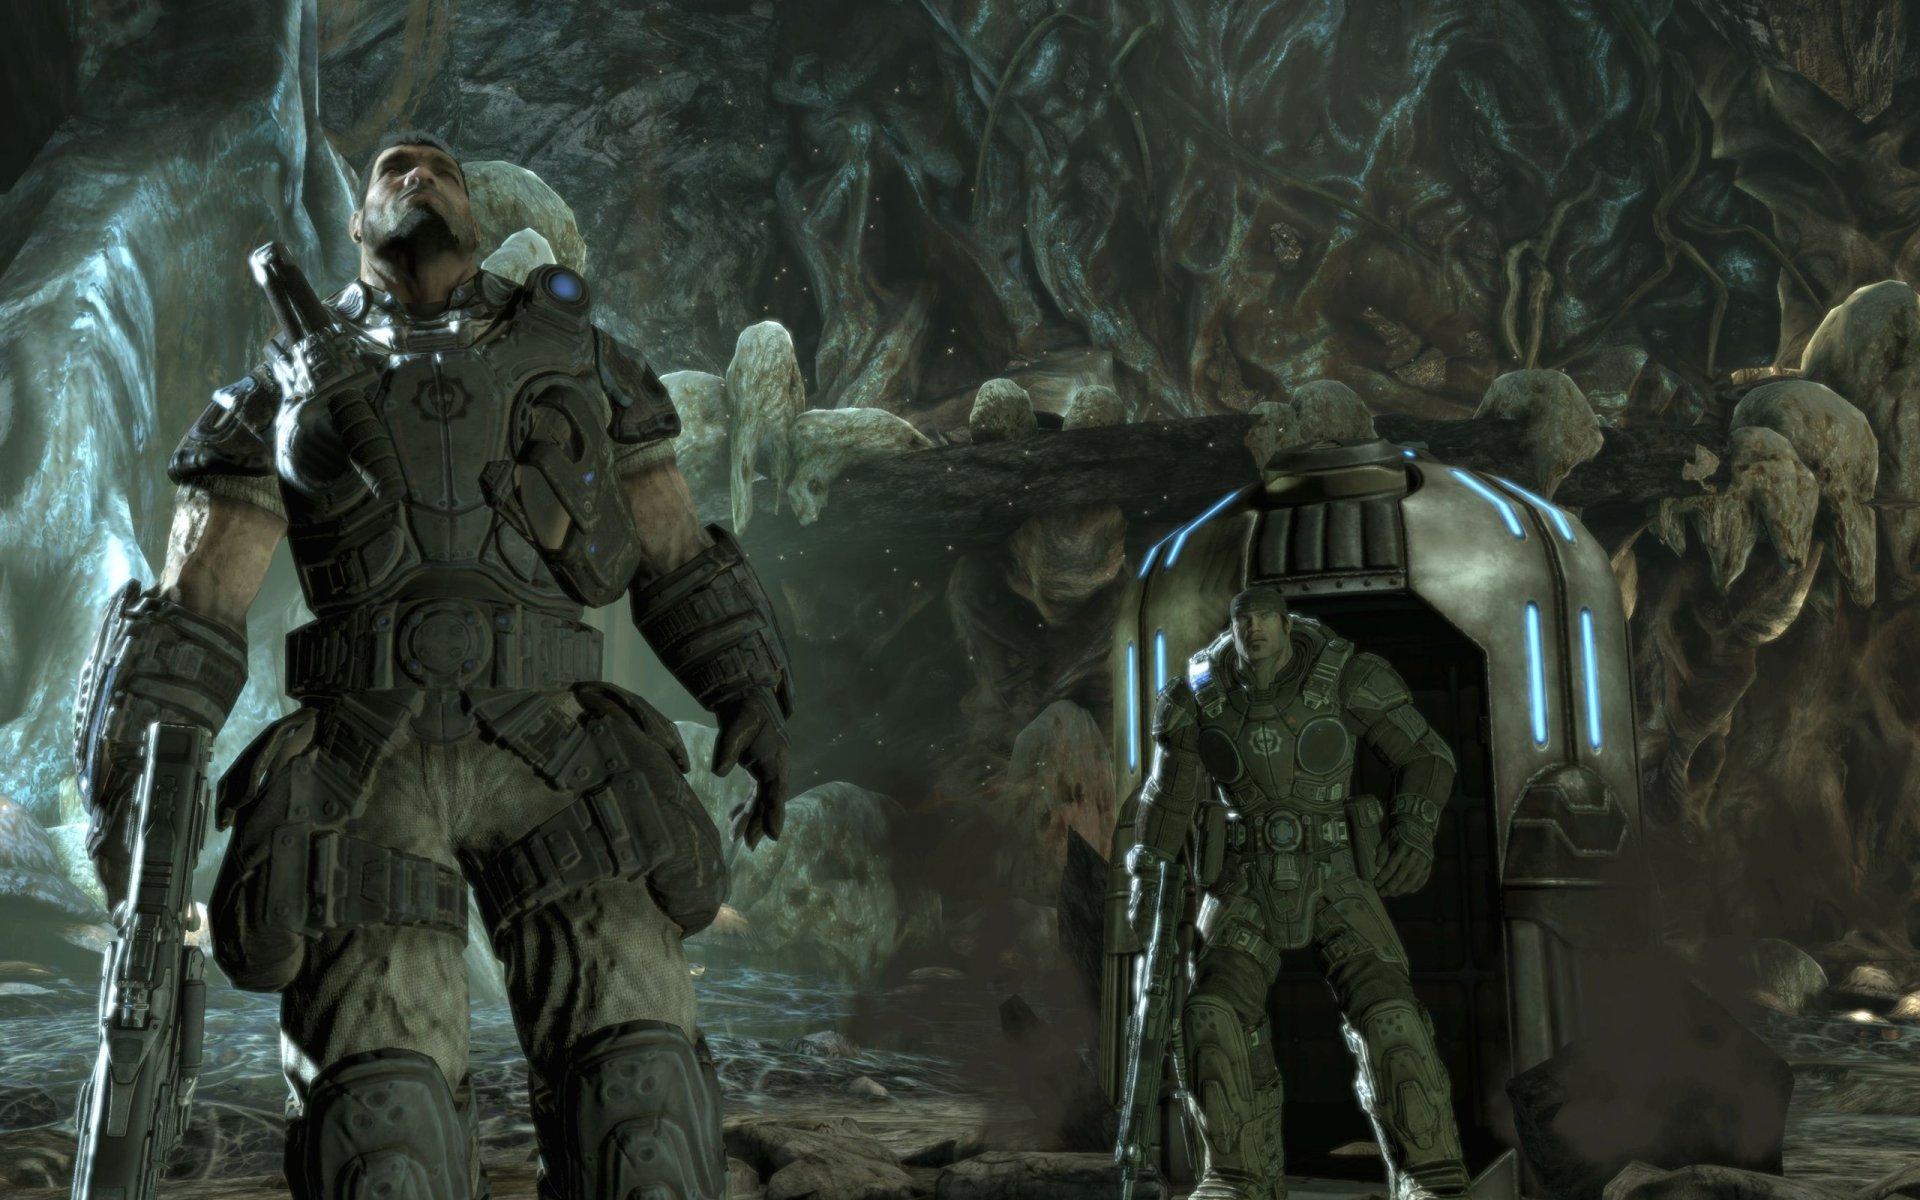 Gears Of War 2 Full HD Fondo De Pantalla And Fondo De